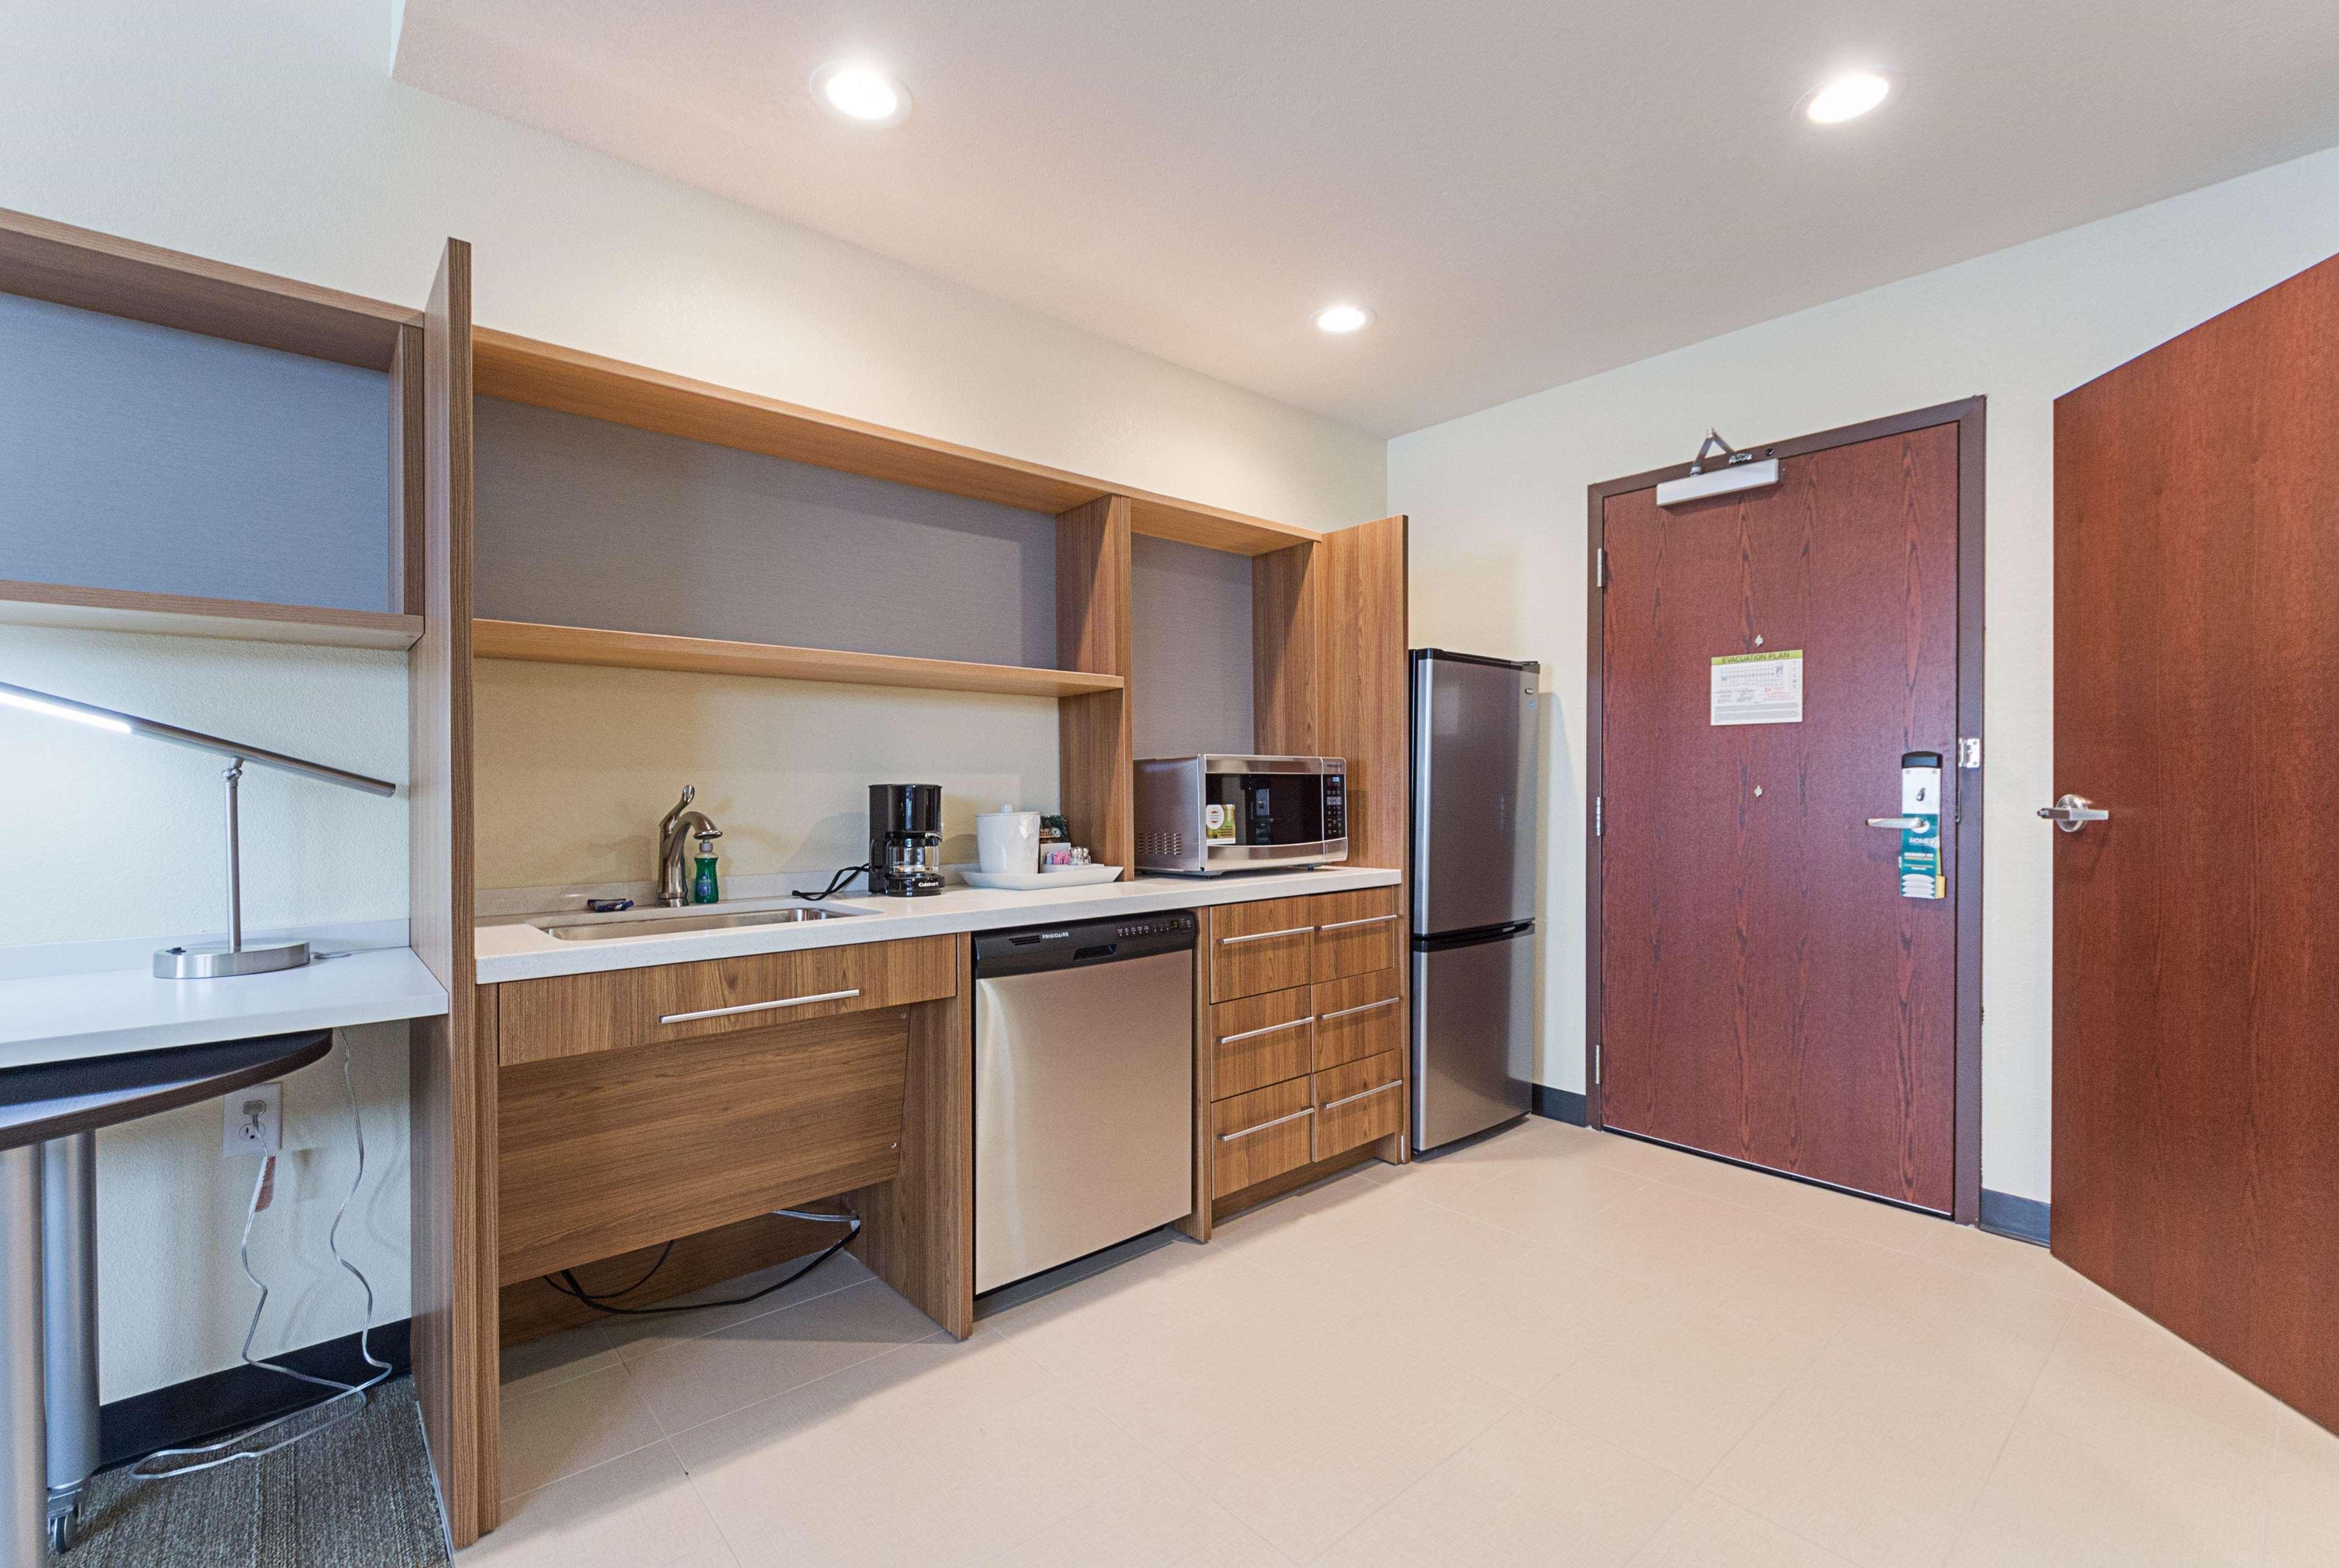 Home 2 Suites by Hilton - Yukon image 45